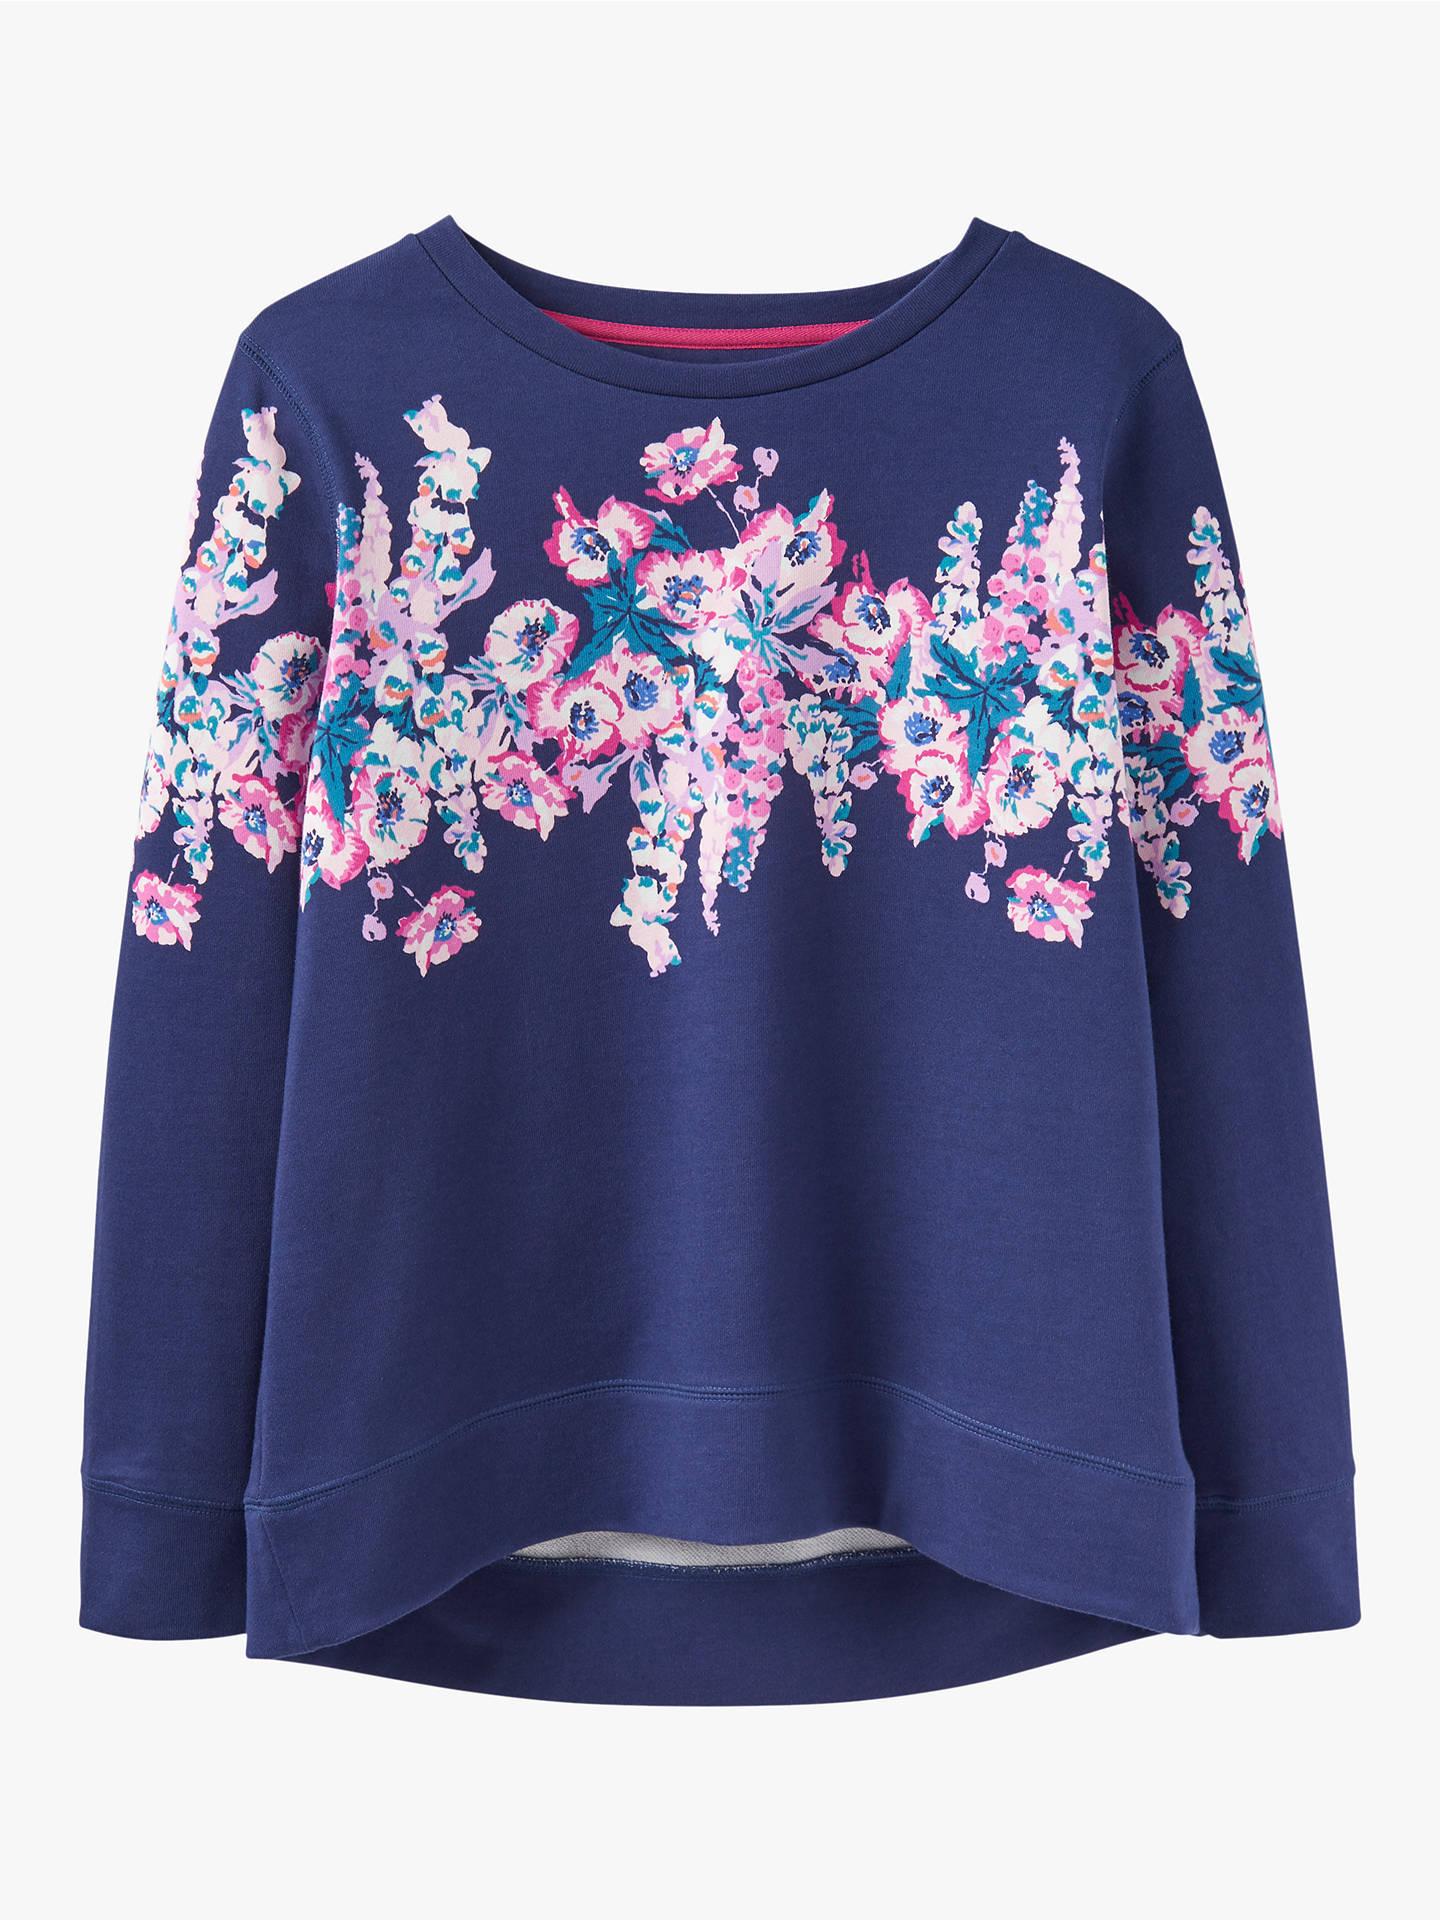 63aeb3abcf Joules Ellen Floral Sweatshirt, Blue at John Lewis & Partners